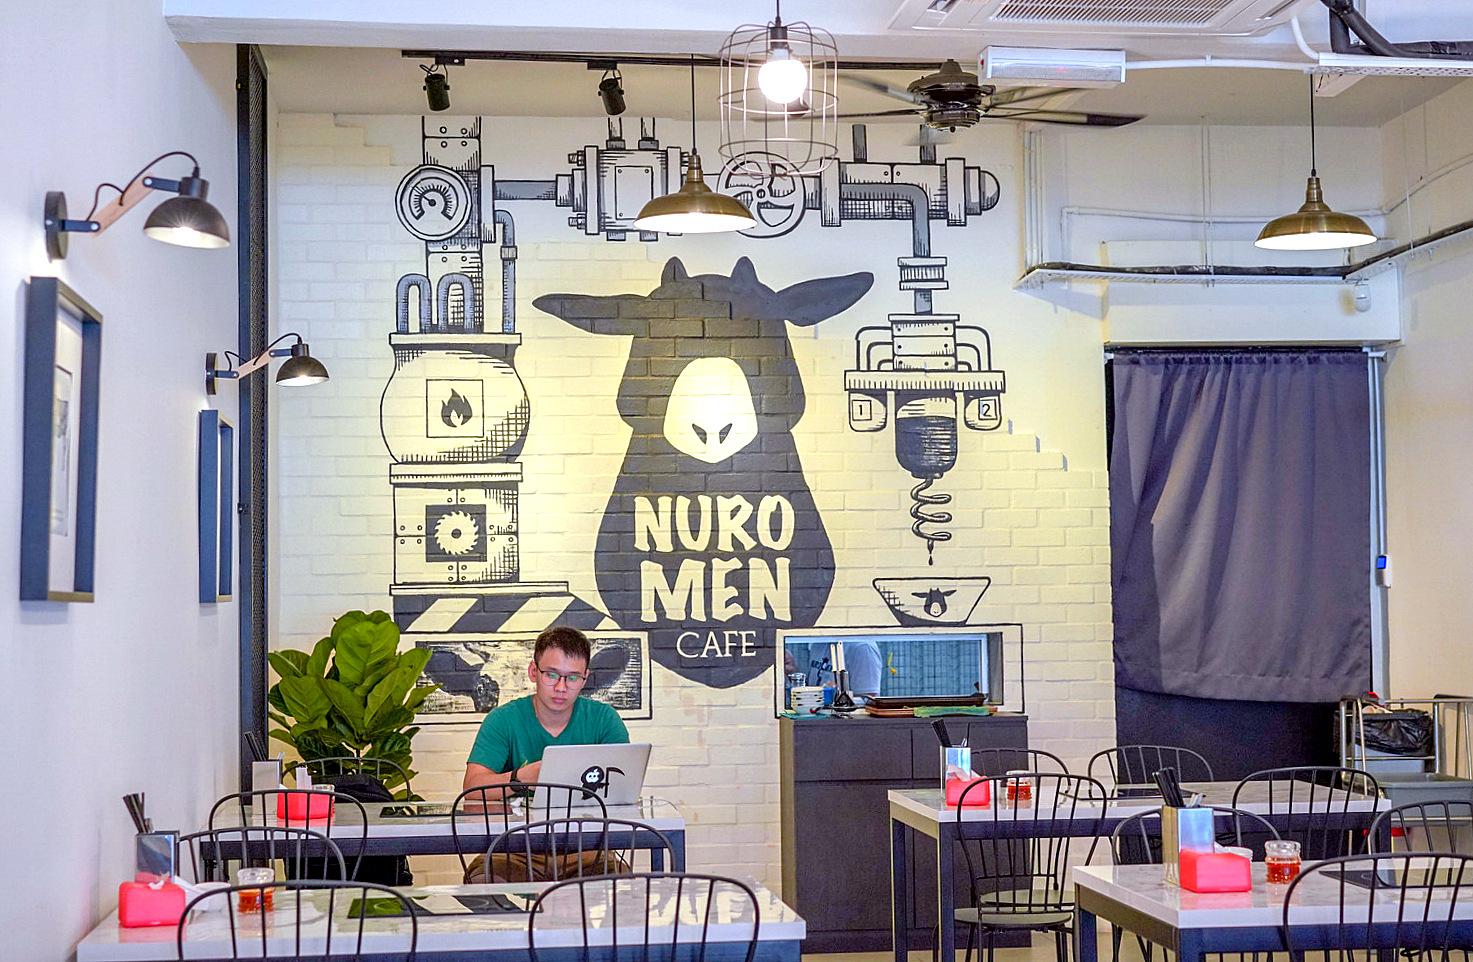 Nuromen Cafe, Damansara Uptown